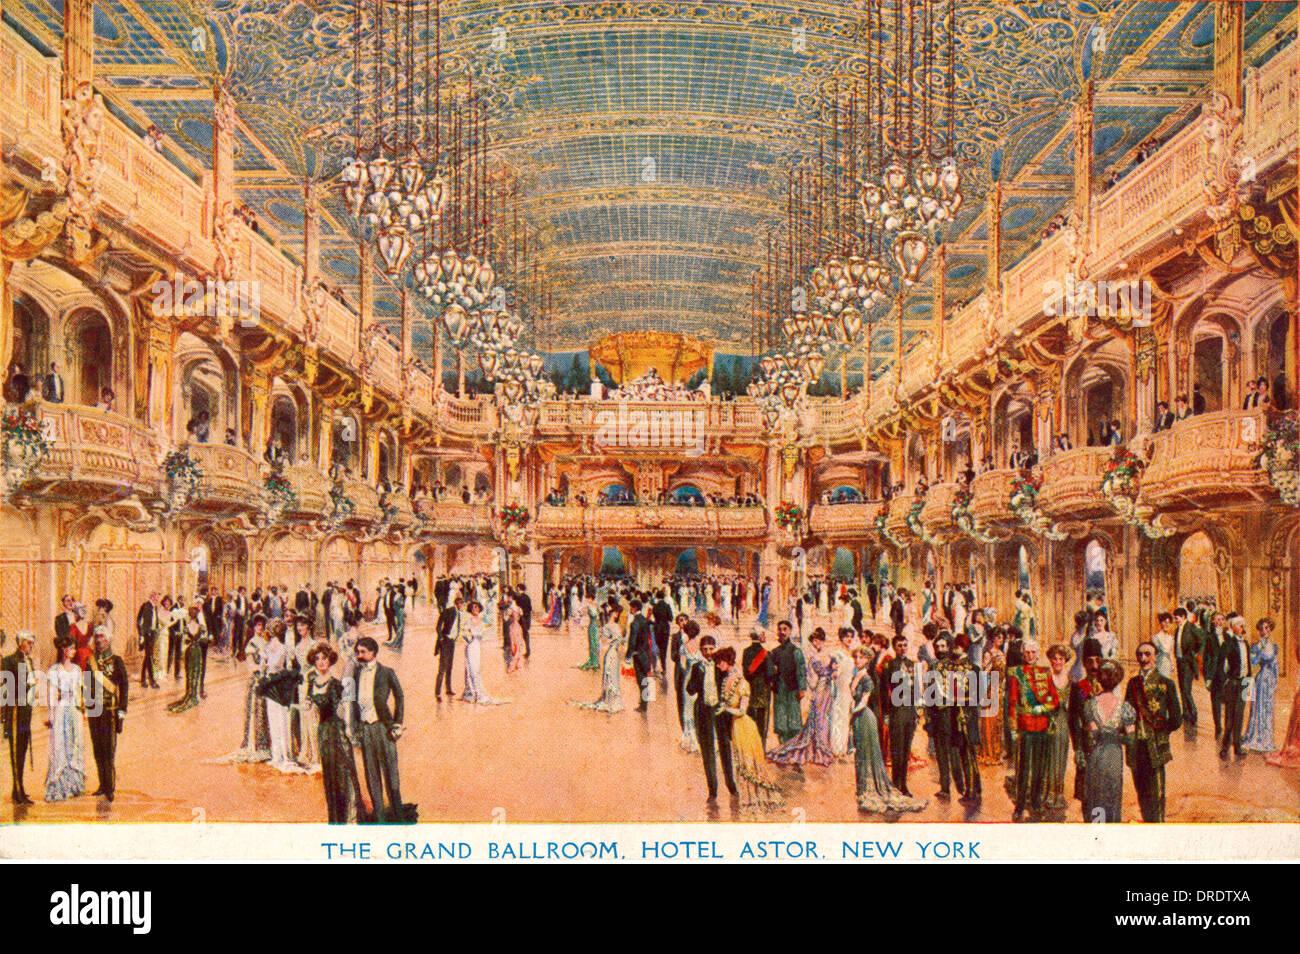 Hotel Astor, New York - Stock Image